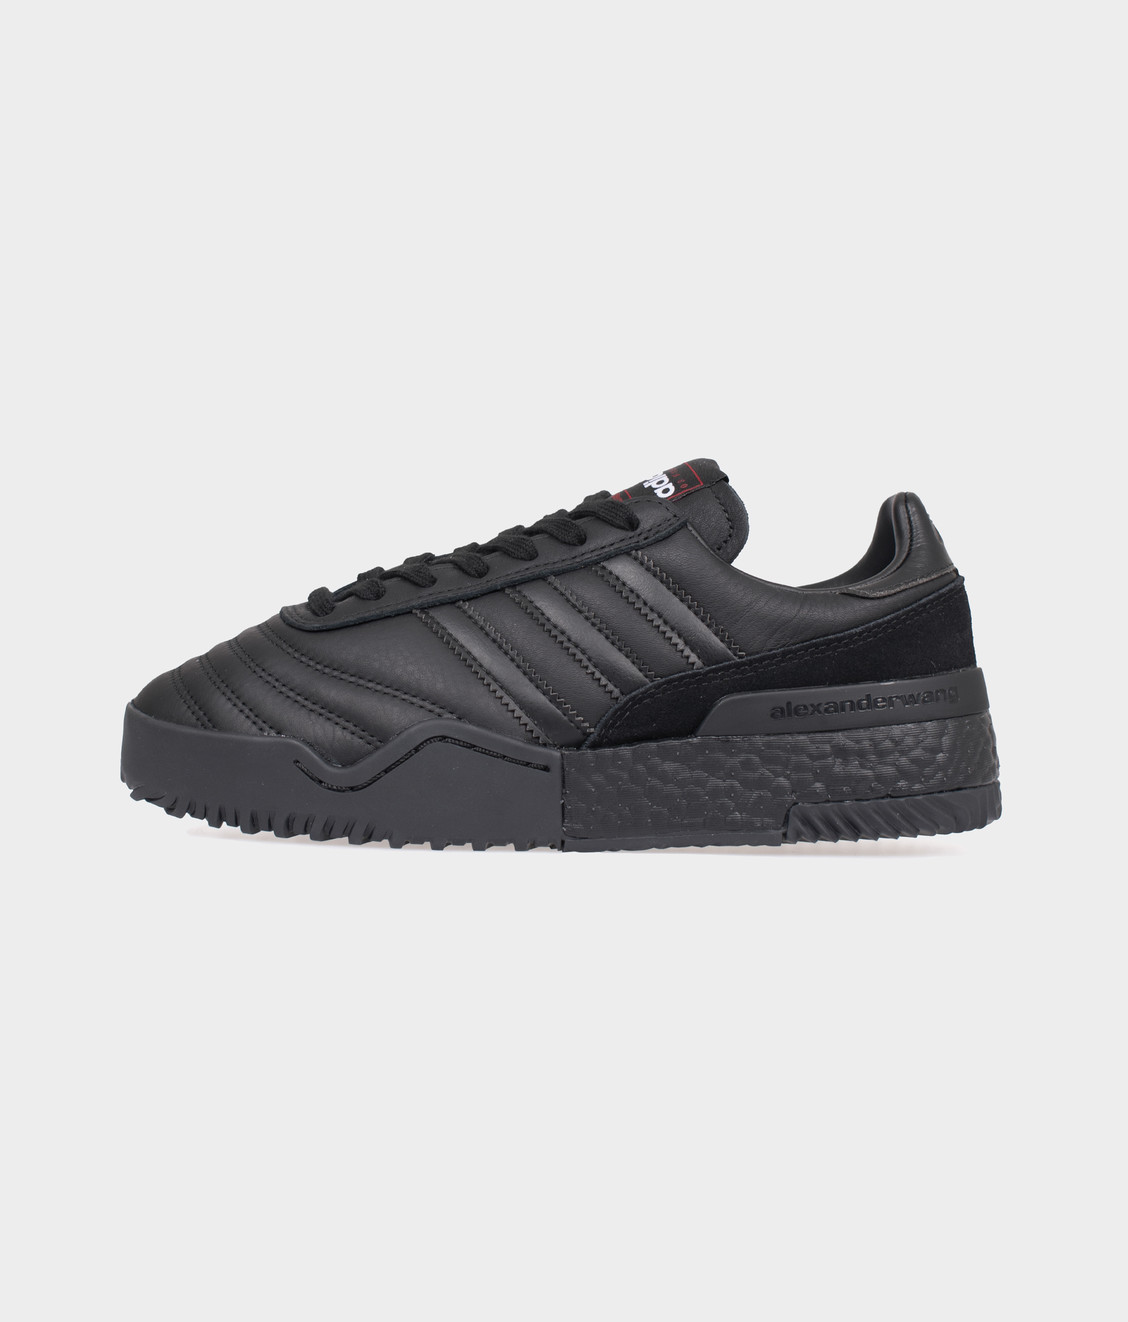 Adidas Adidas Alexander Wang Bbal Soccer Black